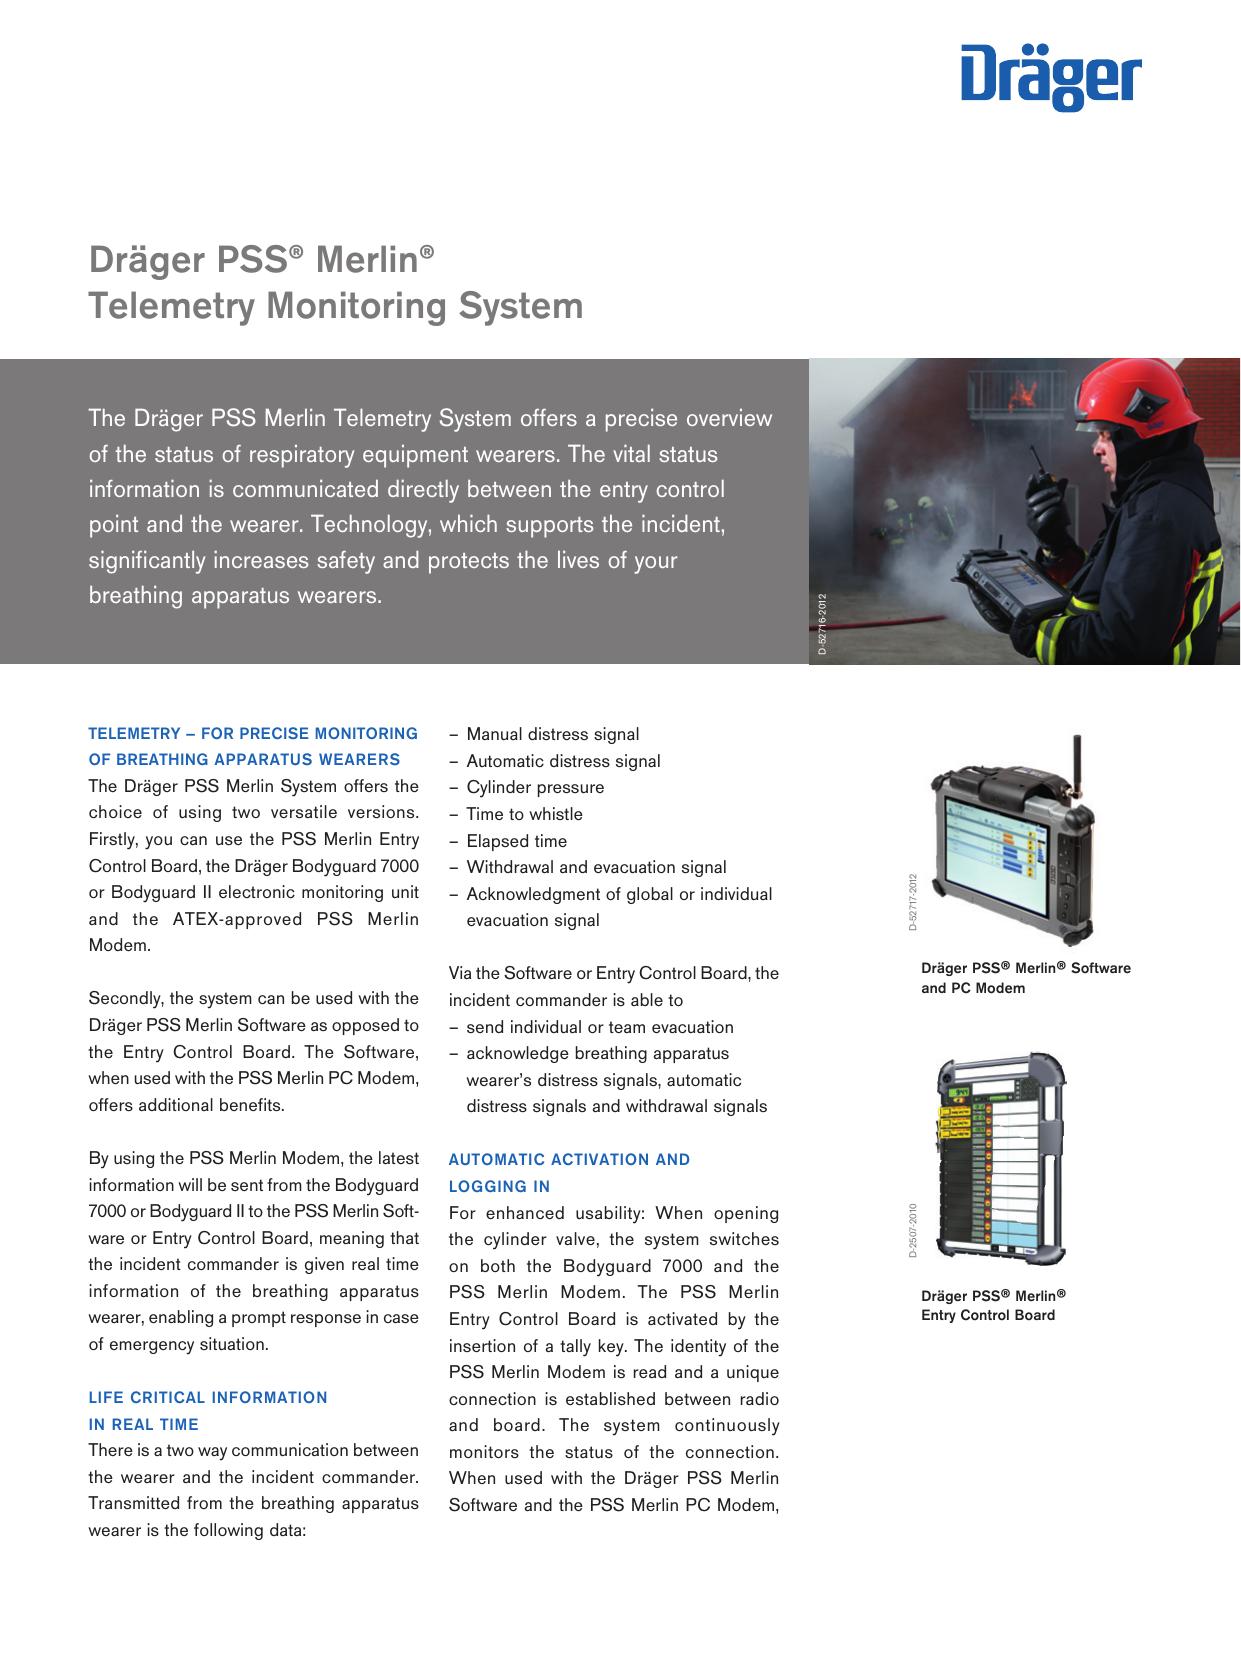 Dräger PSS® Merlin® Telemetry Monitoring System | manualzz com